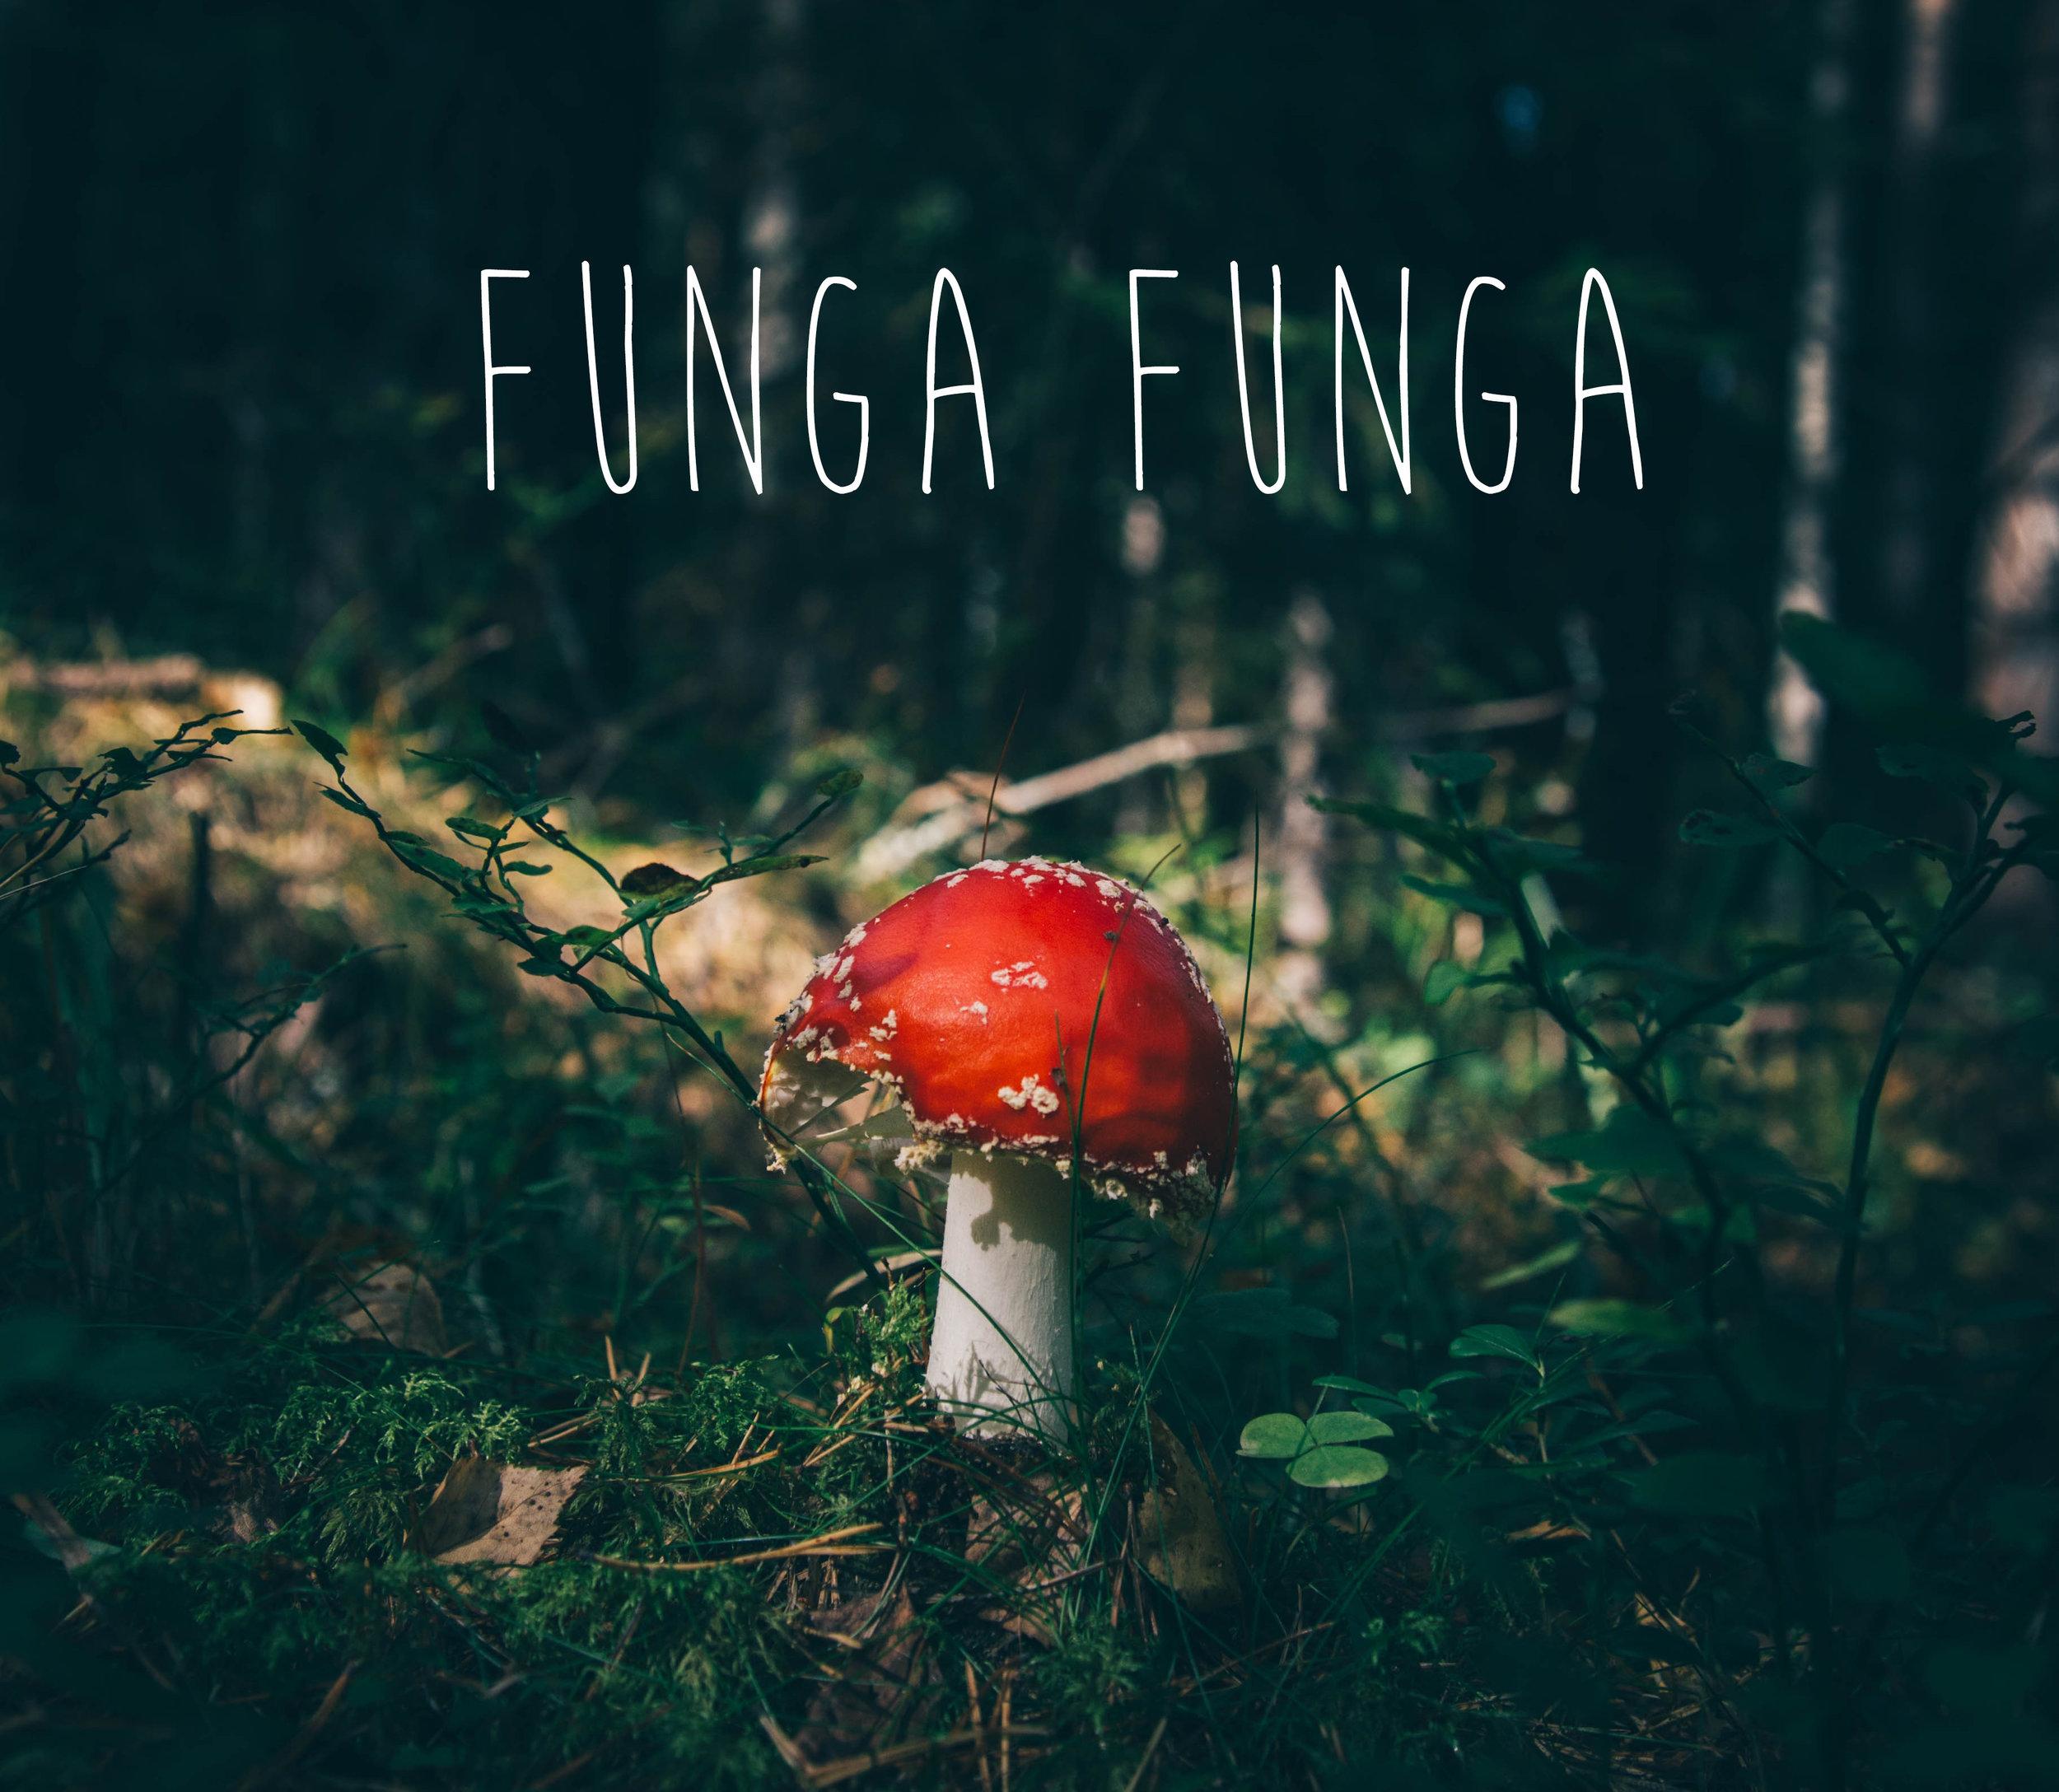 værkskitse_funga-funga.jpg